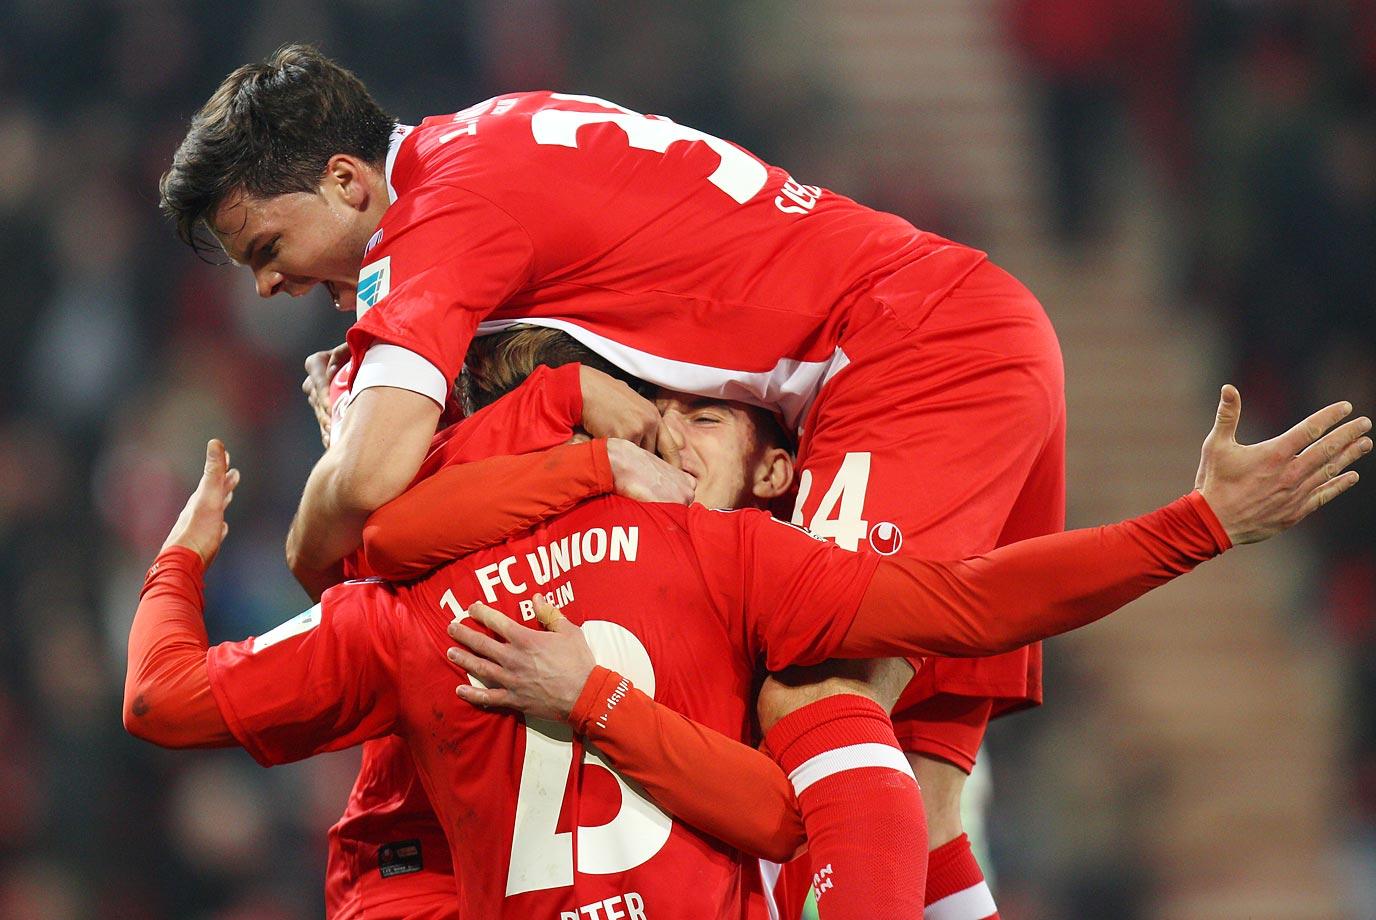 Sebastian Polter, Valmir Sulejmani and Fabian Schoenheim of 1 FC Union Berlin celebrate during a match against FC St. Pauli.